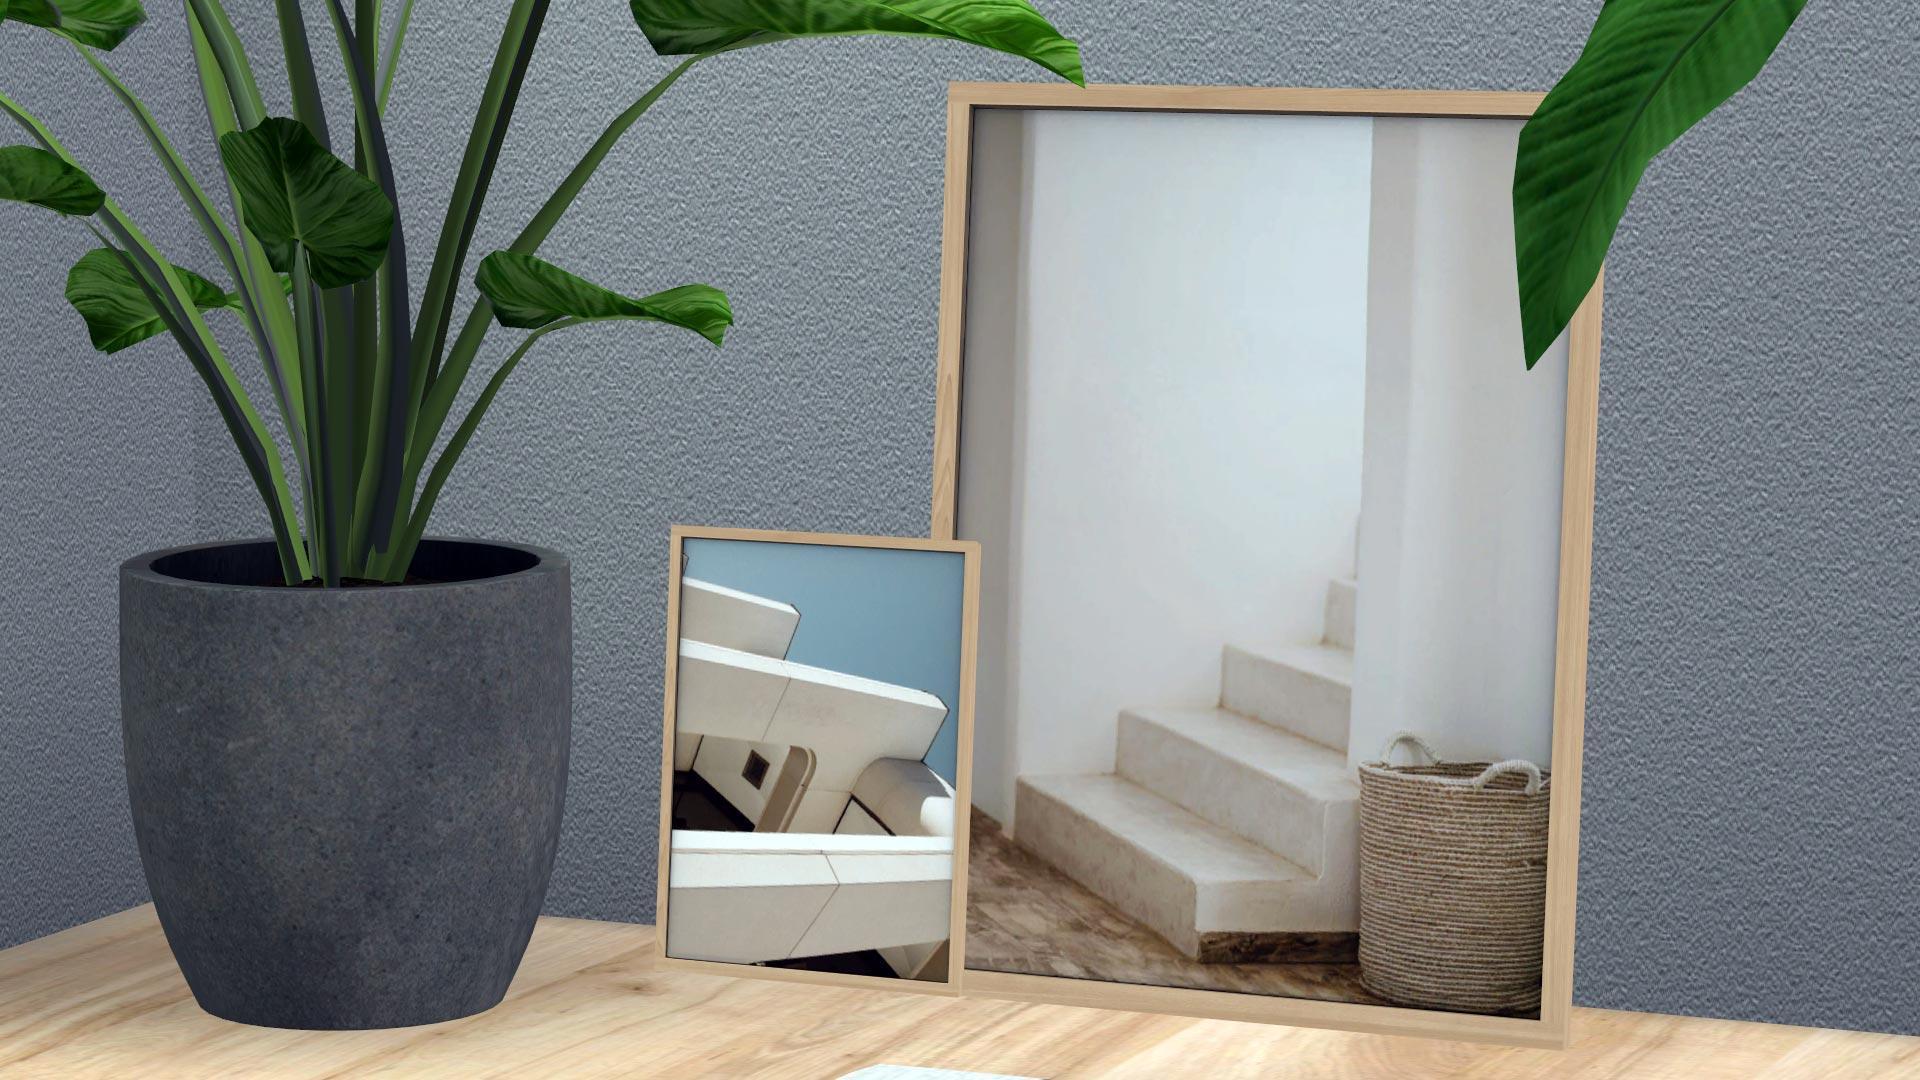 Minimalist Floor Print, high quality sims 4 cc, sunkissedlilacs, free sims 4 furniture, sims 4 custom content,